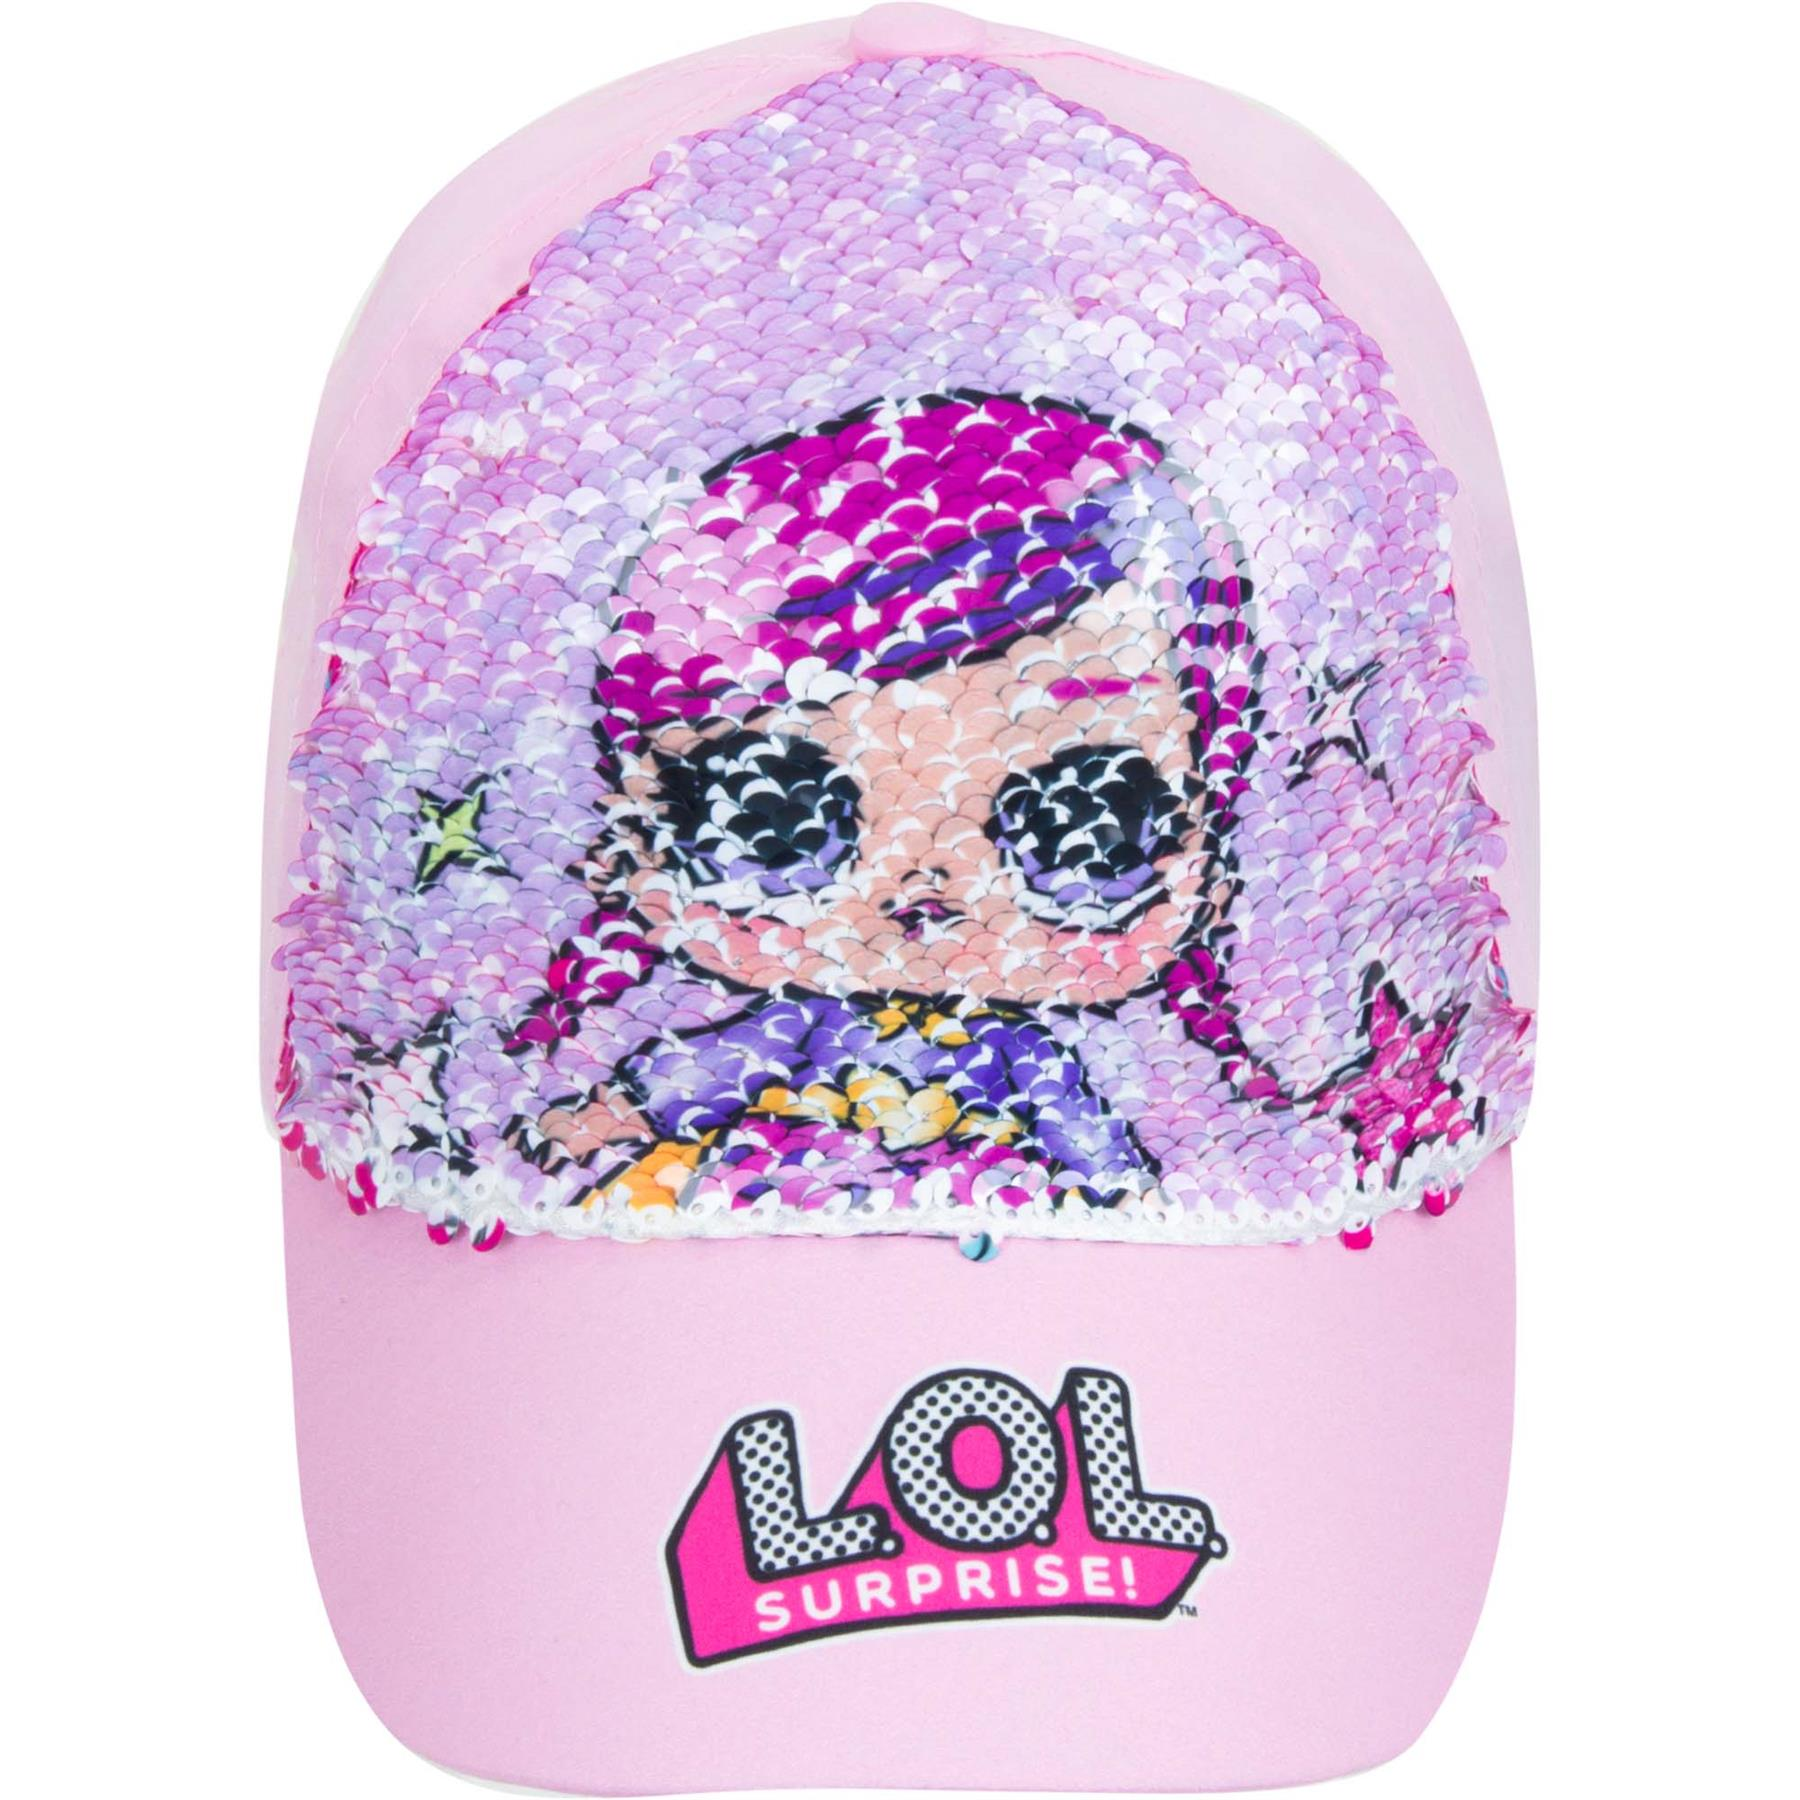 Girls-Cap-LOL-Surprise-Baseball-Reversible-Pink-Sequin-Hat-Sun-Summer thumbnail 7